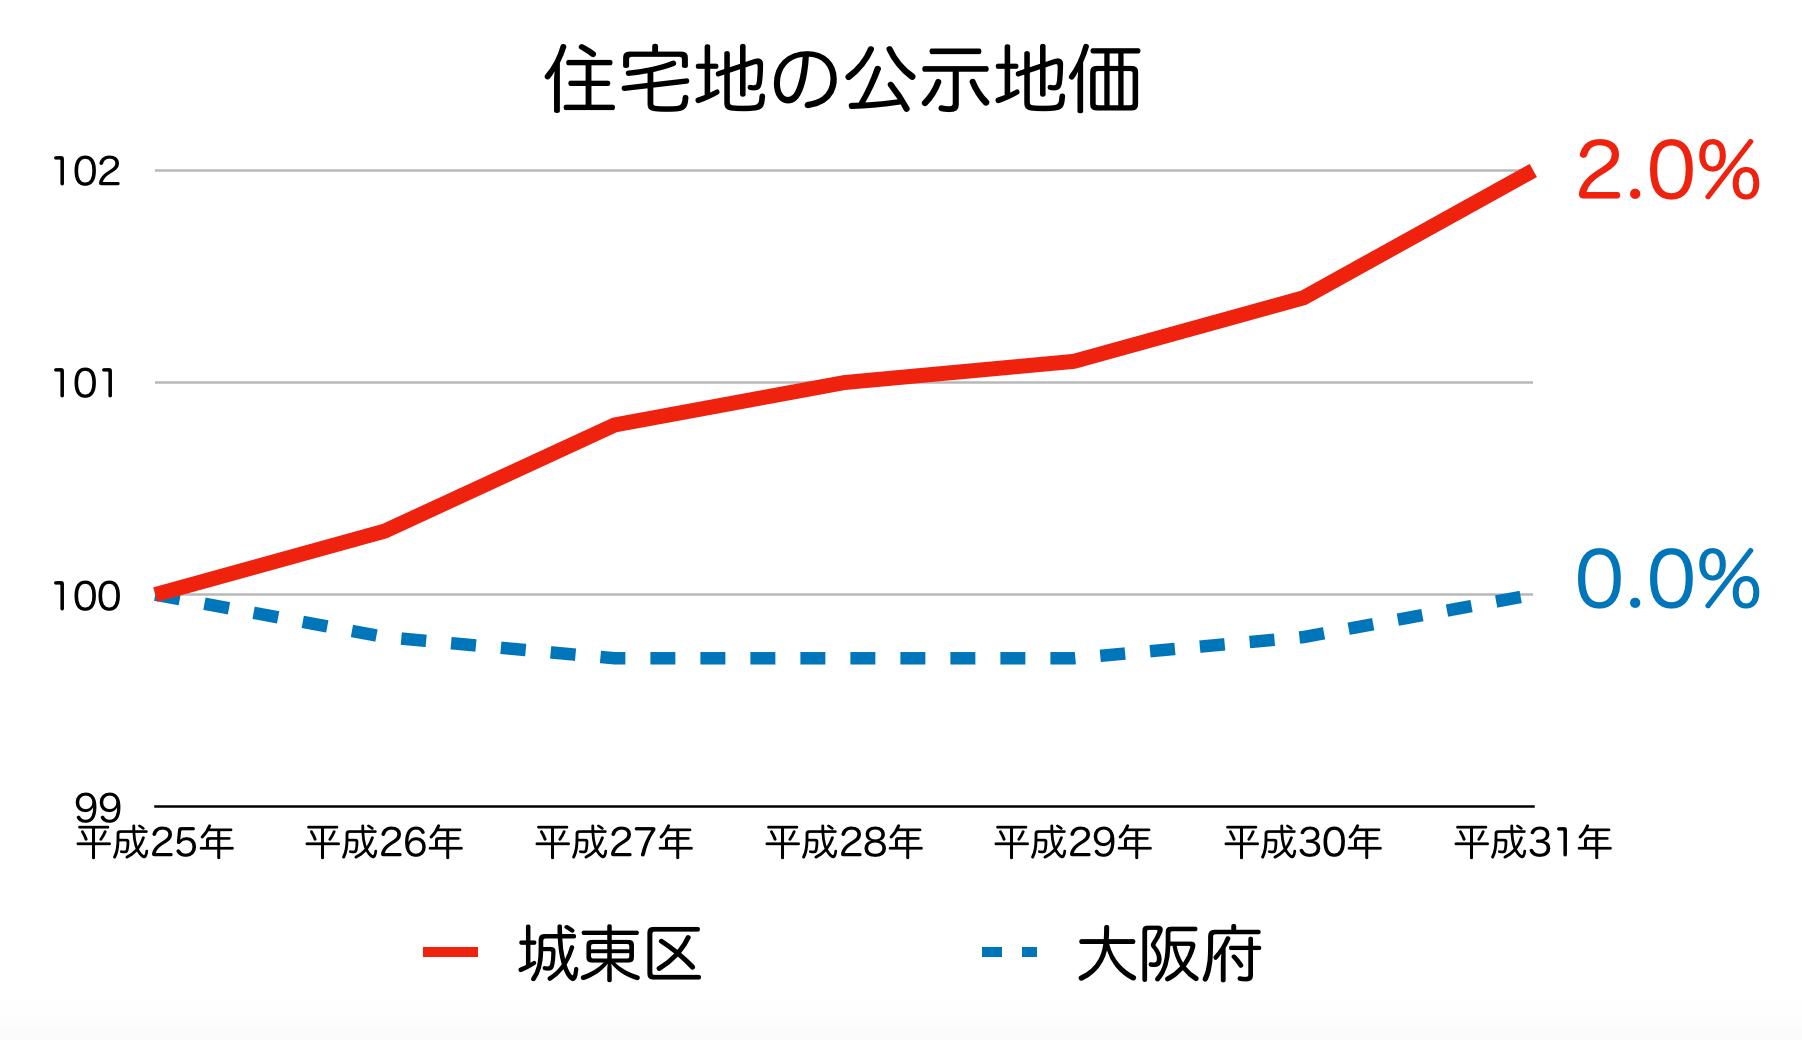 大阪市城東区の公示地価 H25-H31